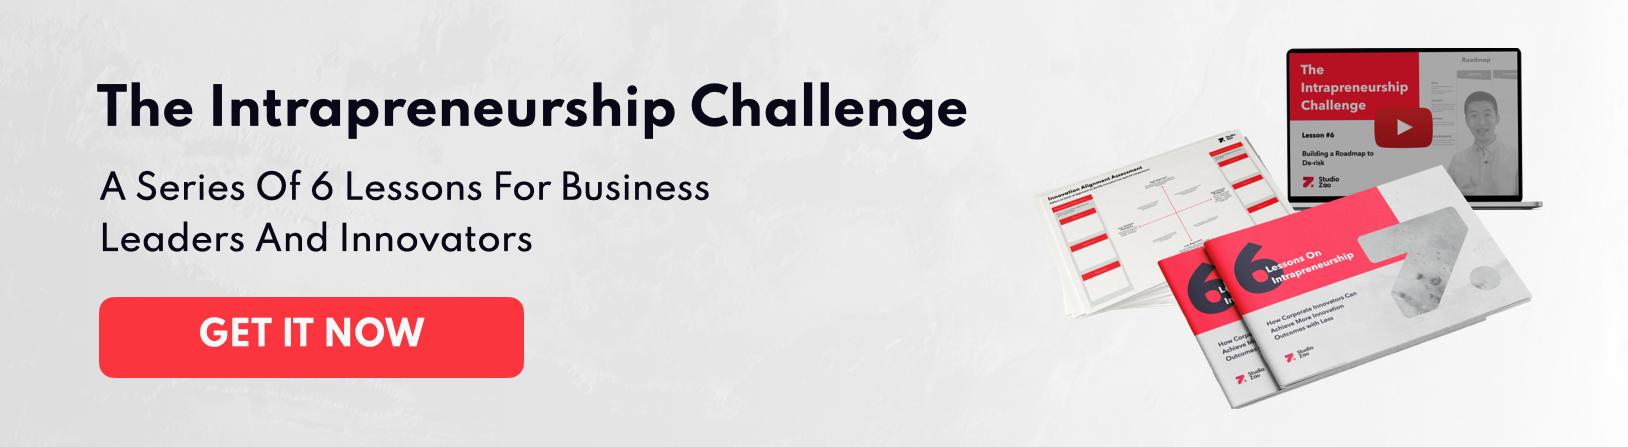 The Intrapreneurship Challenge Banner